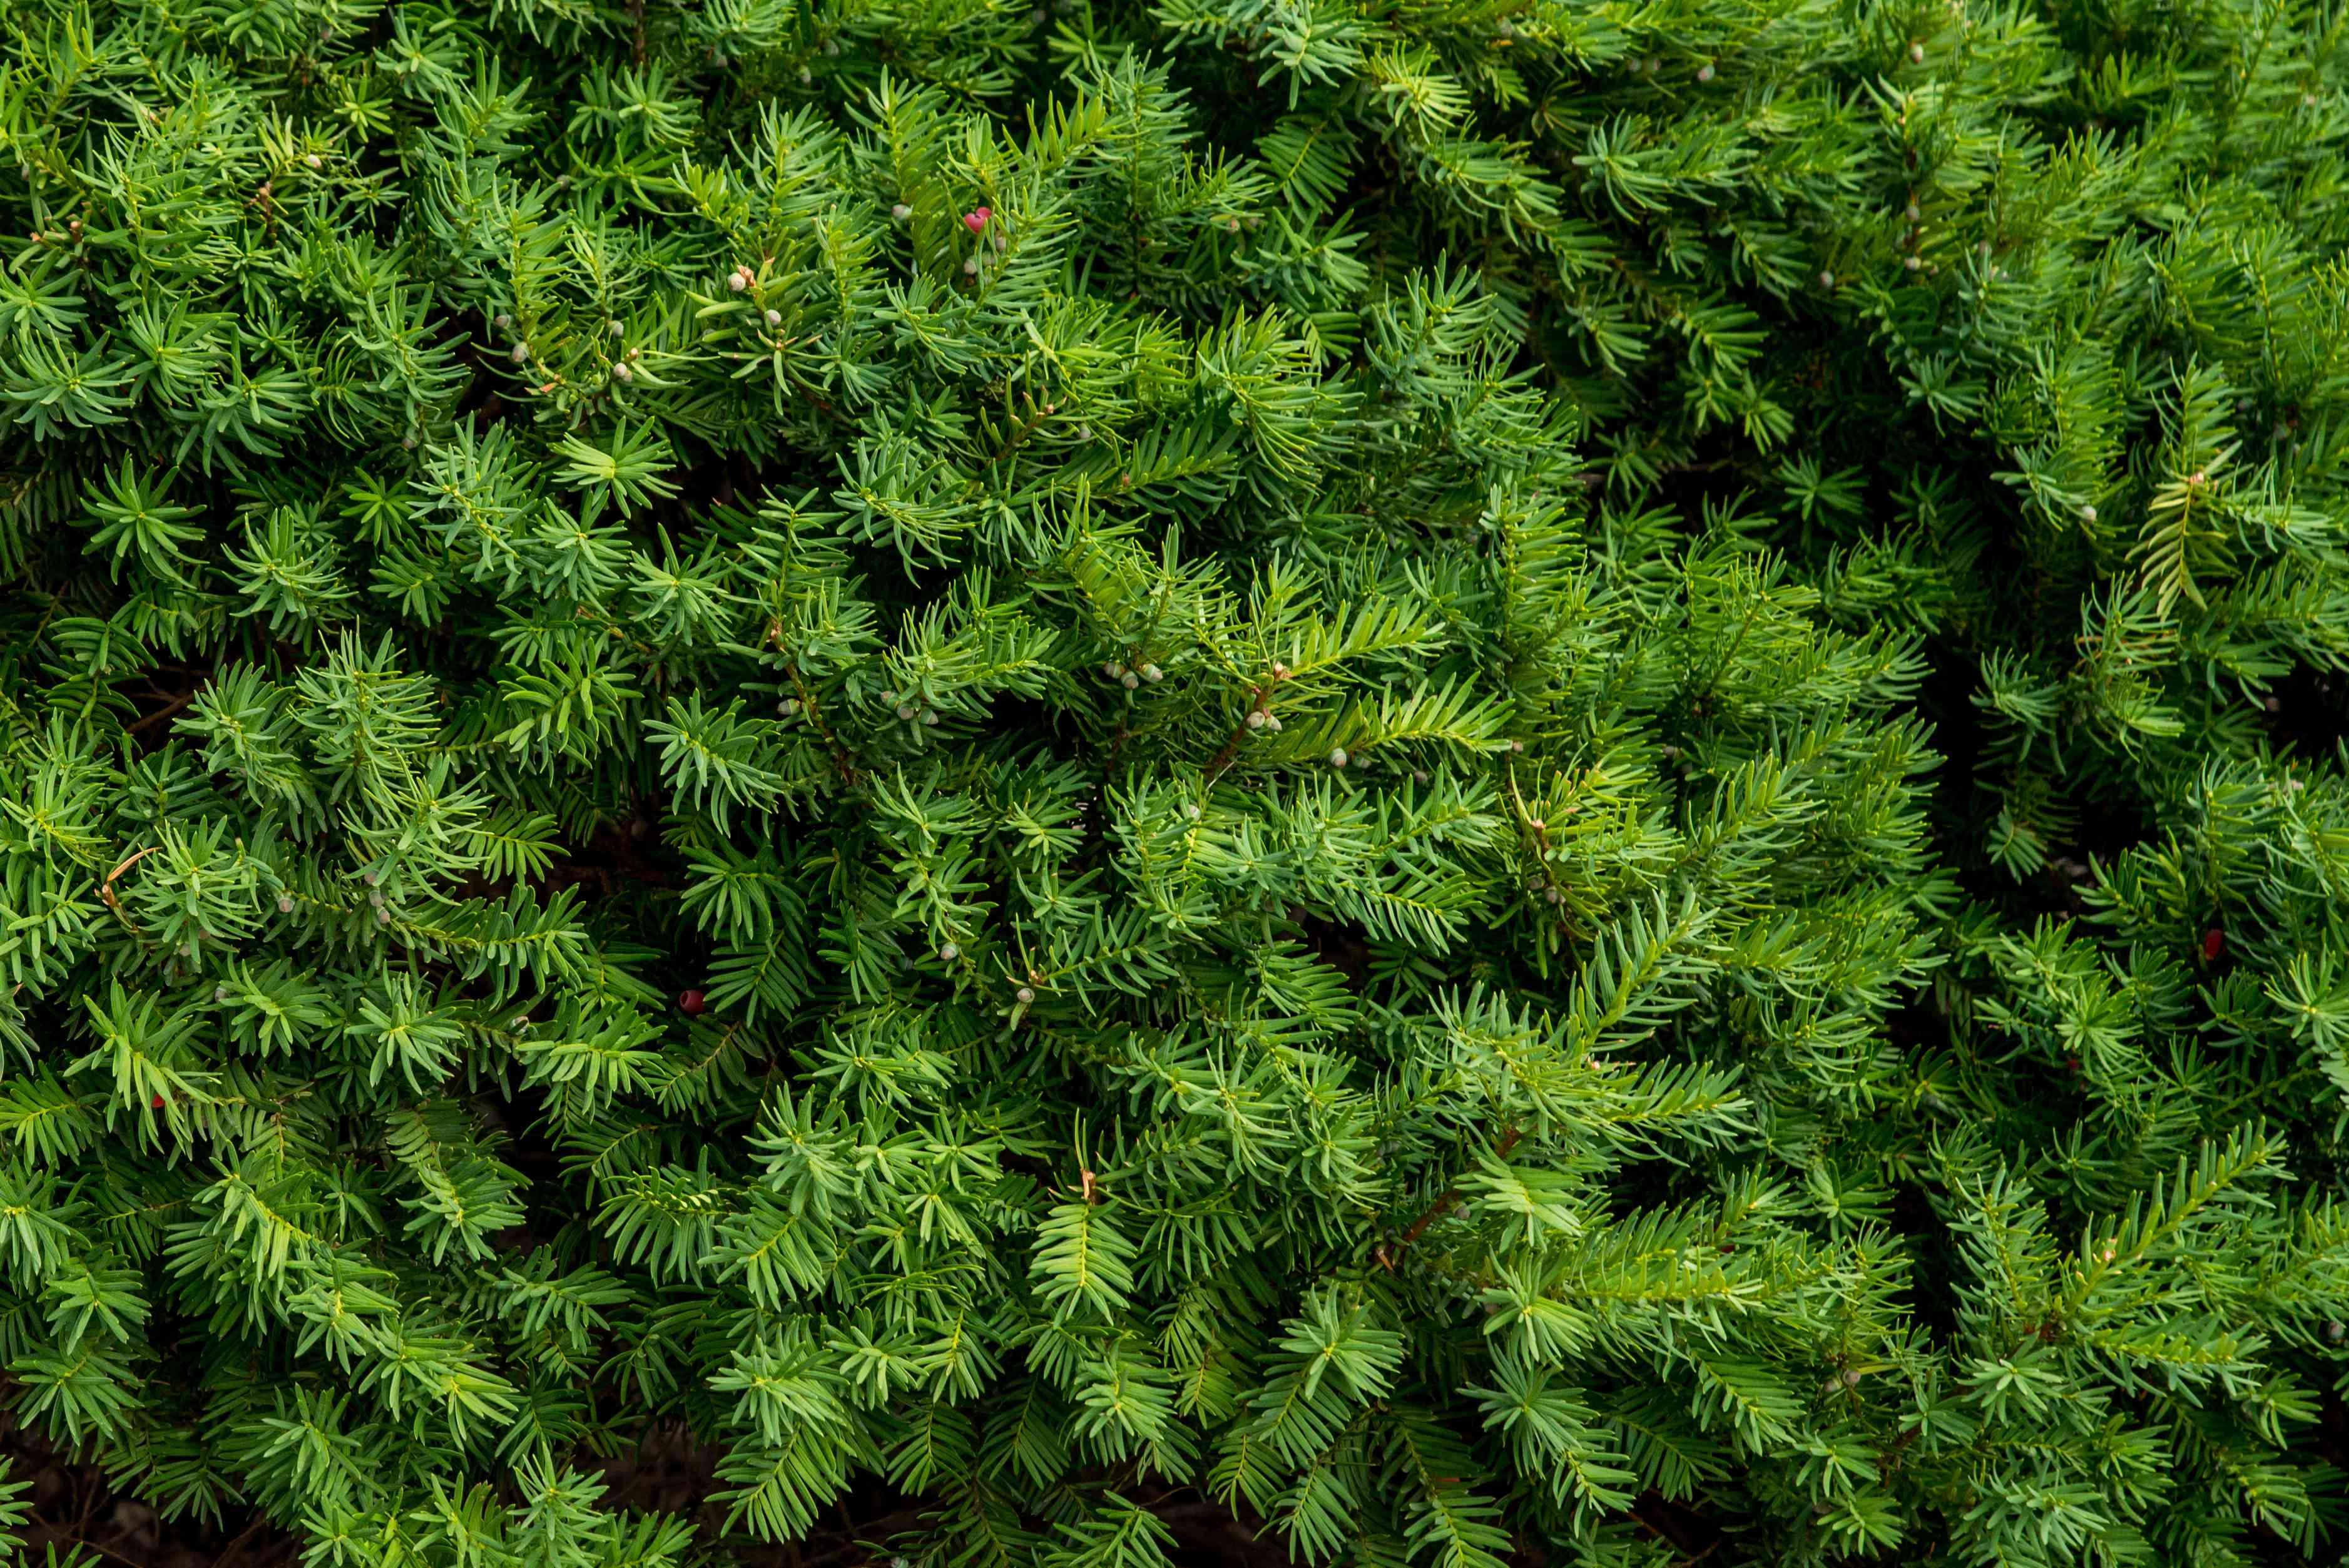 yew foliage detail